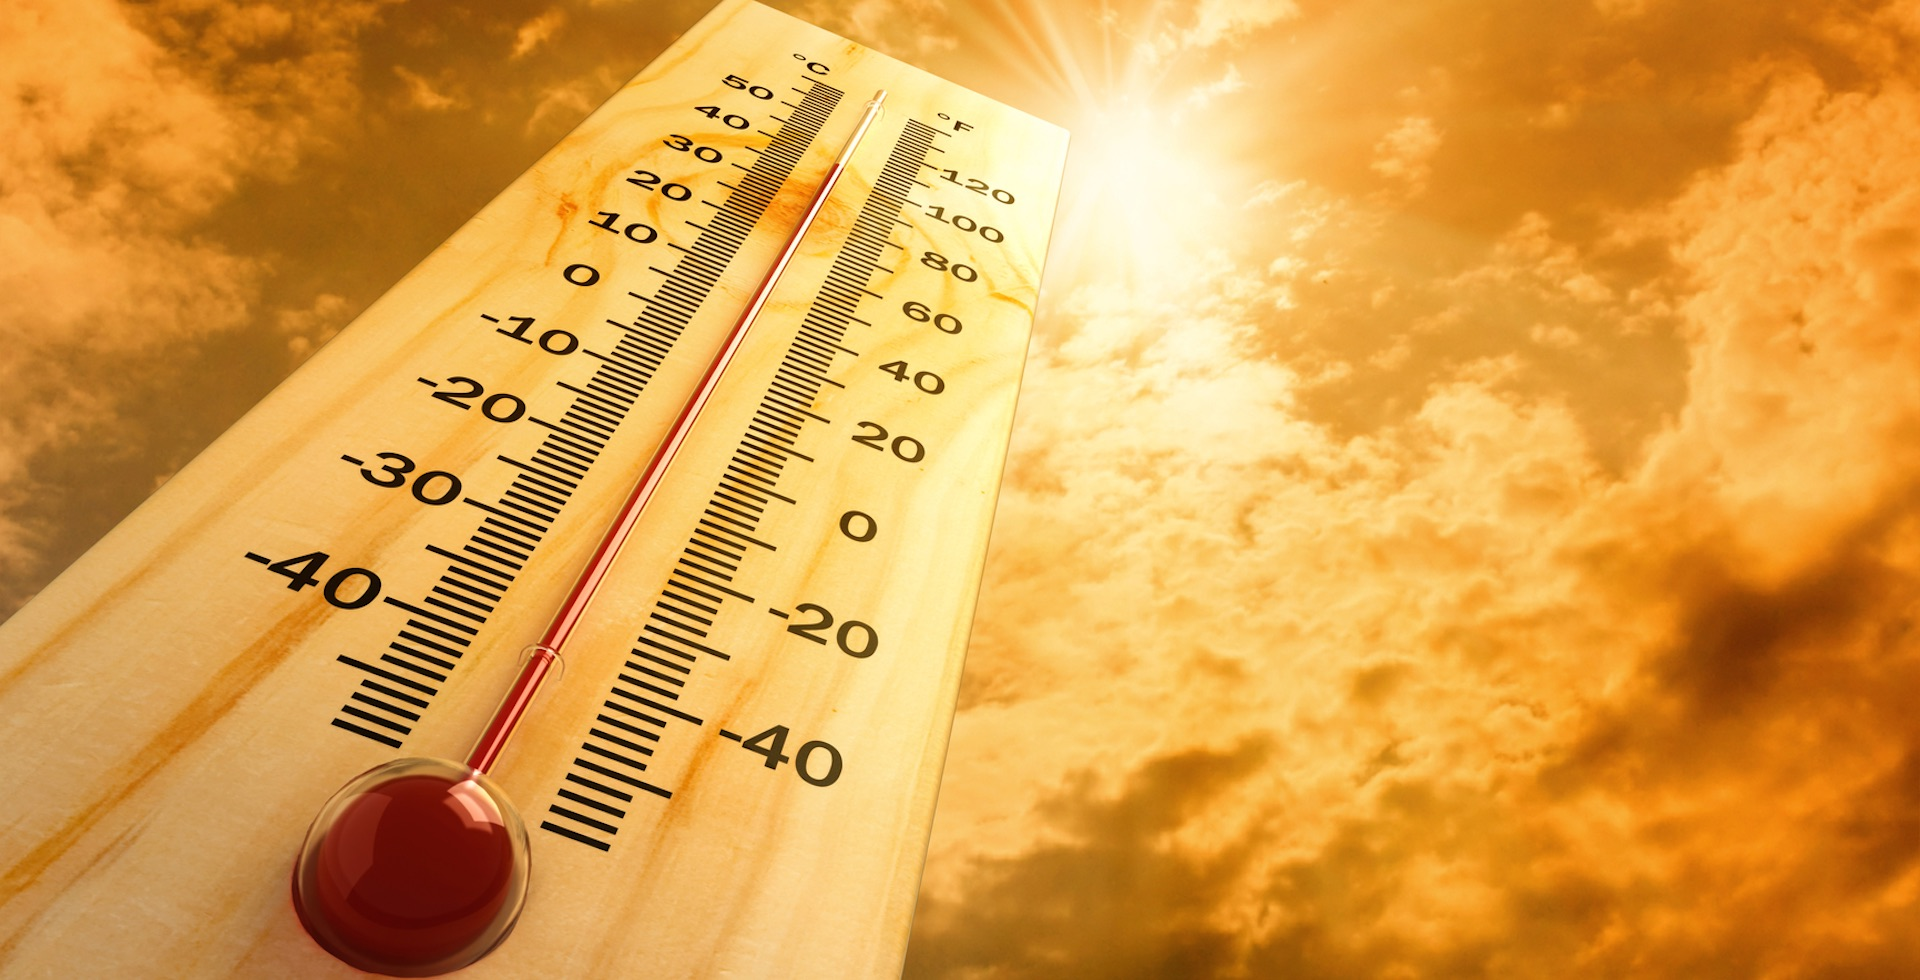 Termometre Nedir? Termometre Çalışma Prensibi